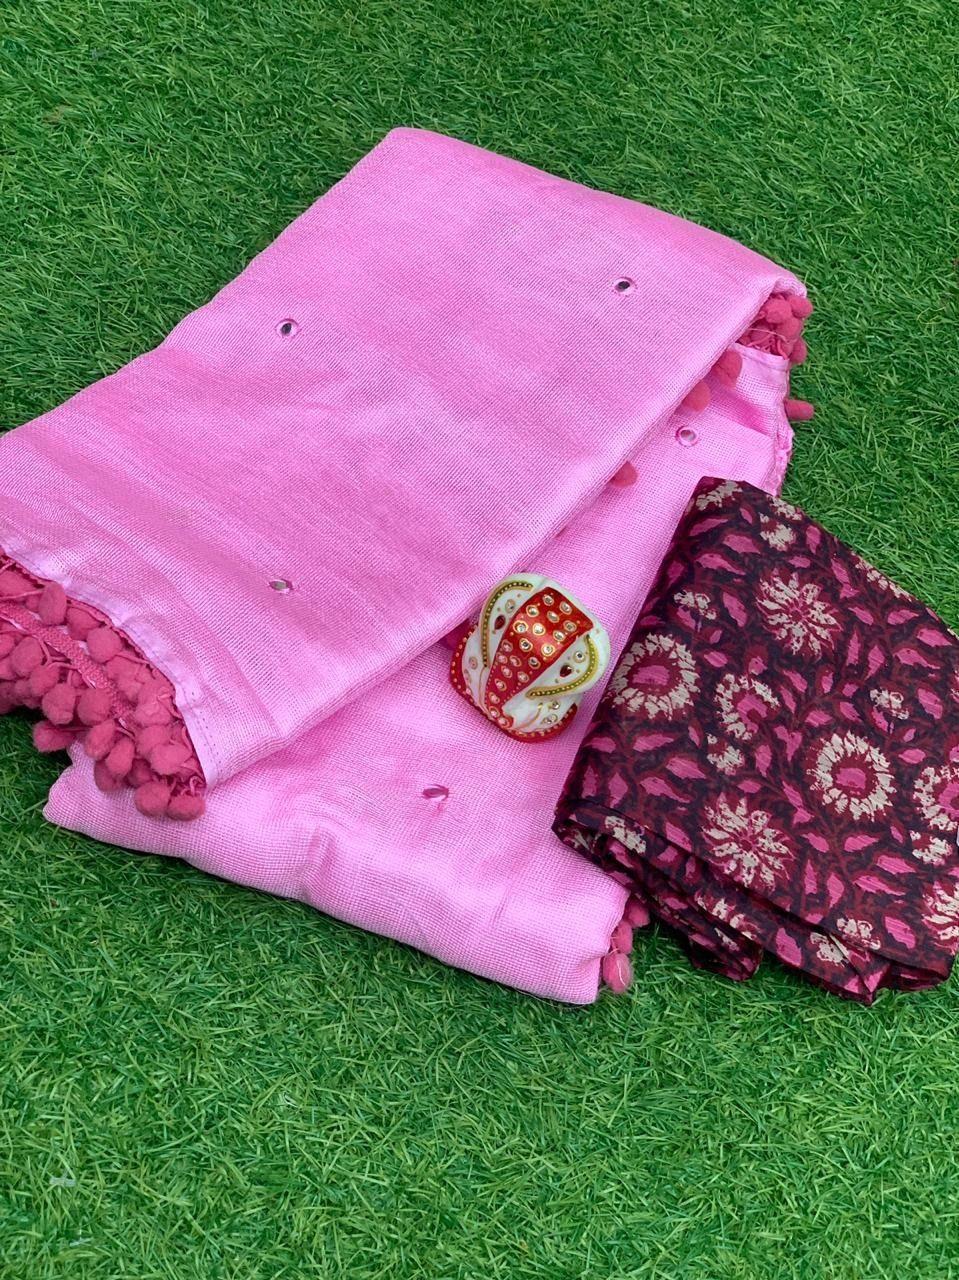 Utsav Fashion Majestic Pink Color Mirror Work Designer Saree In 2020 Utsav Fashion Saree Designs Pink Color